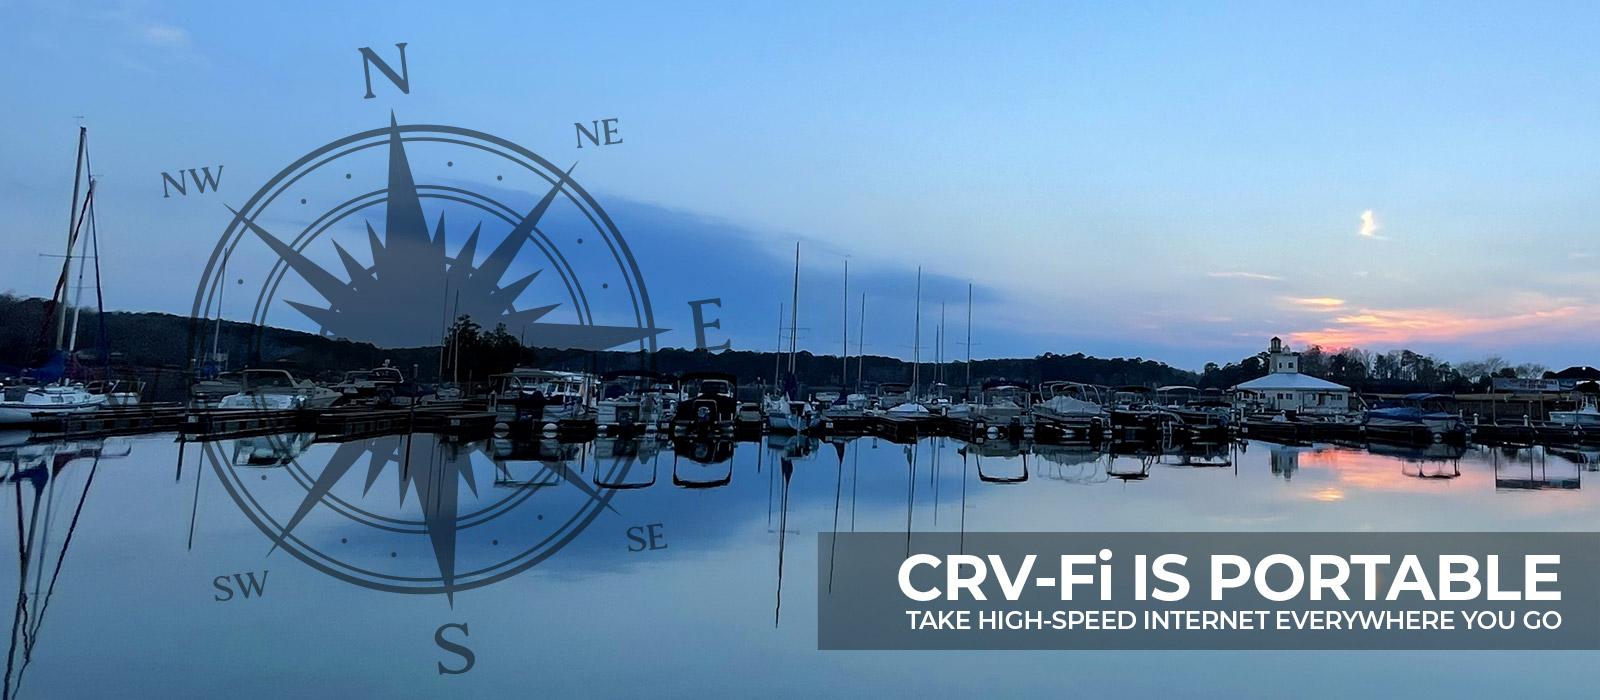 CRV-Fi is portable